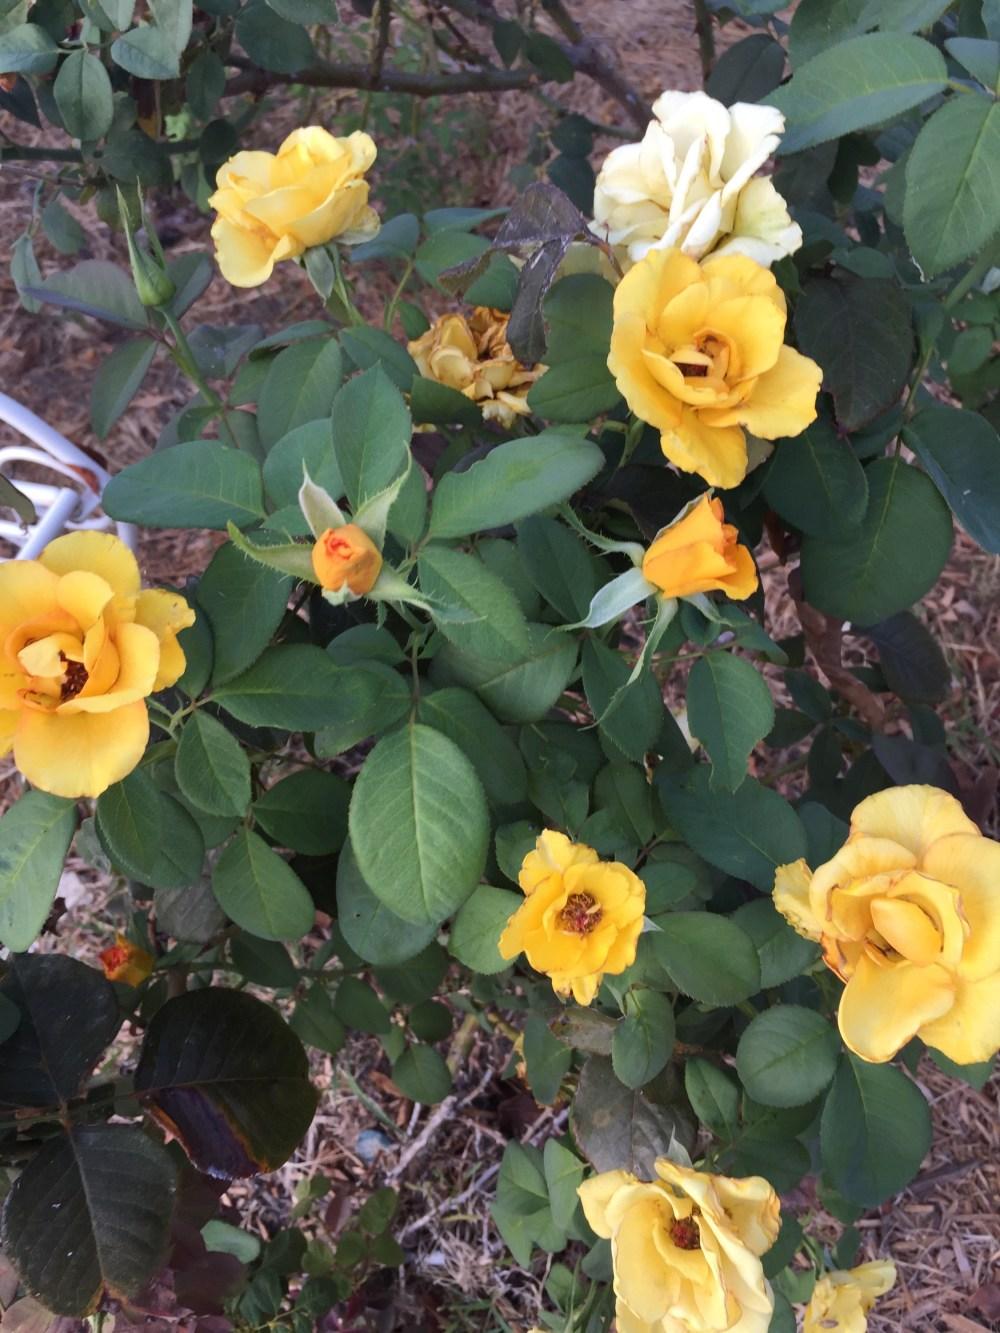 Sundance Rose | The Rose Table